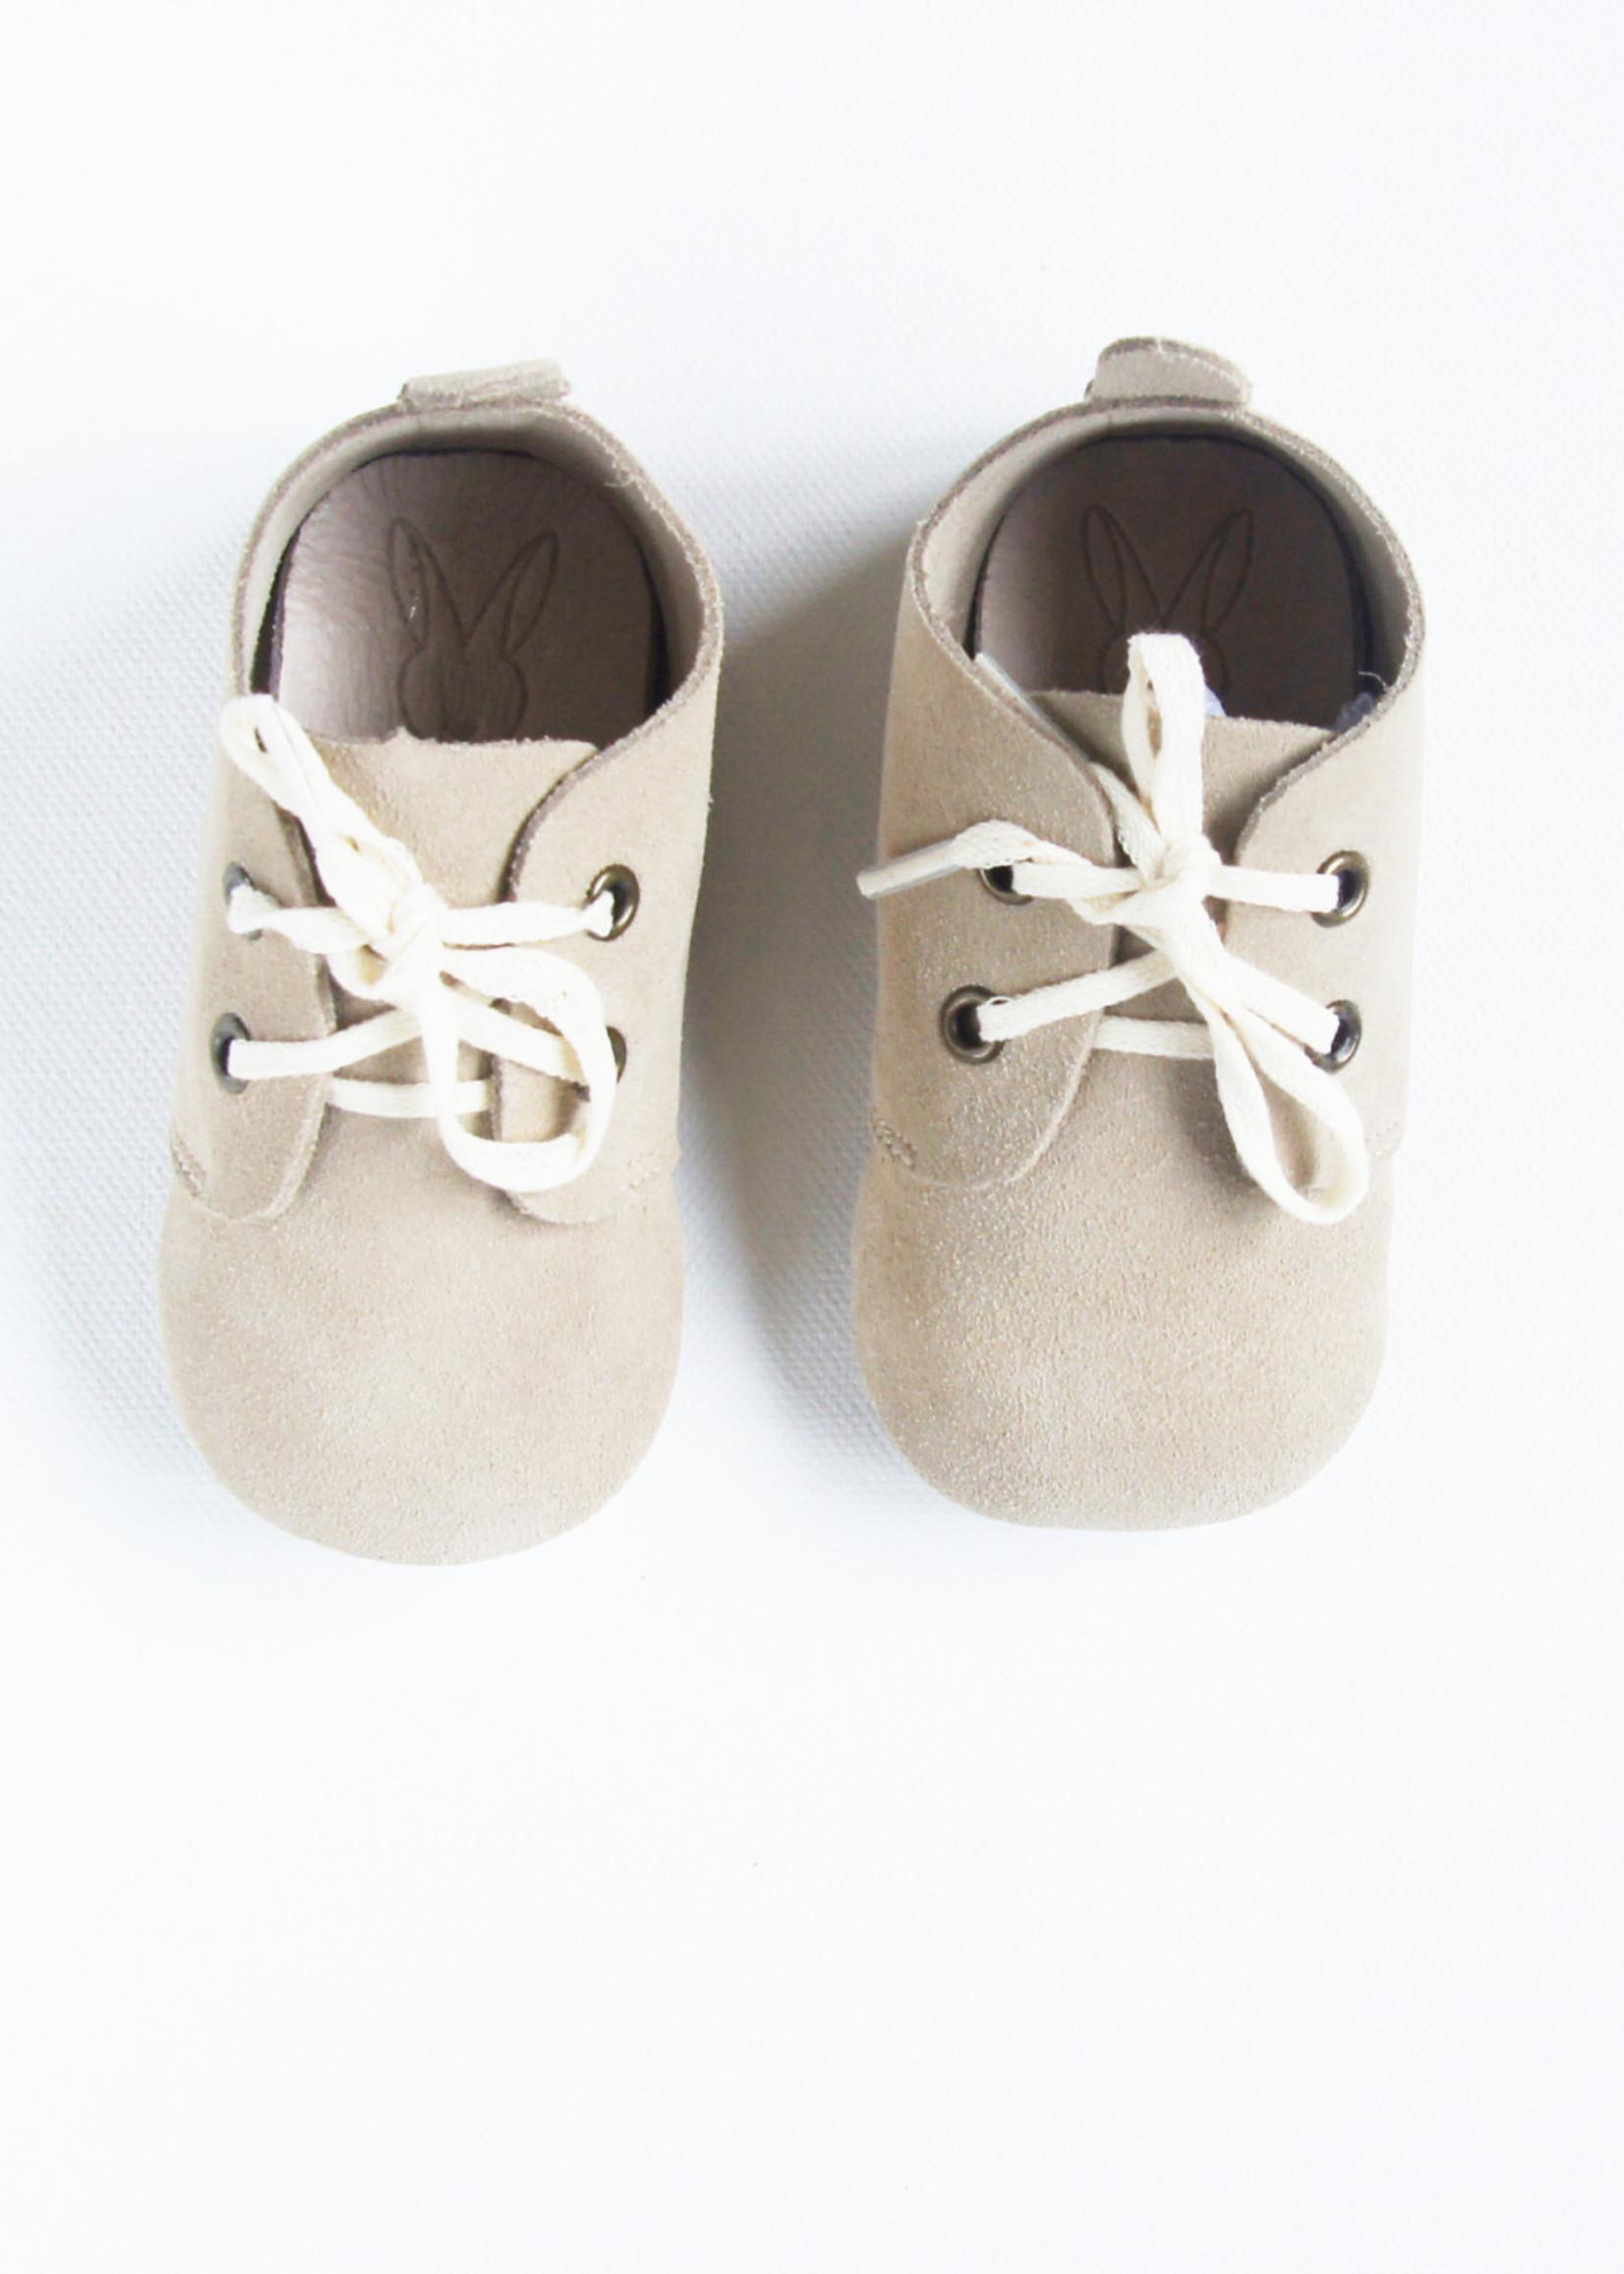 Aston Baby AB Jericho Shoe (Sand)